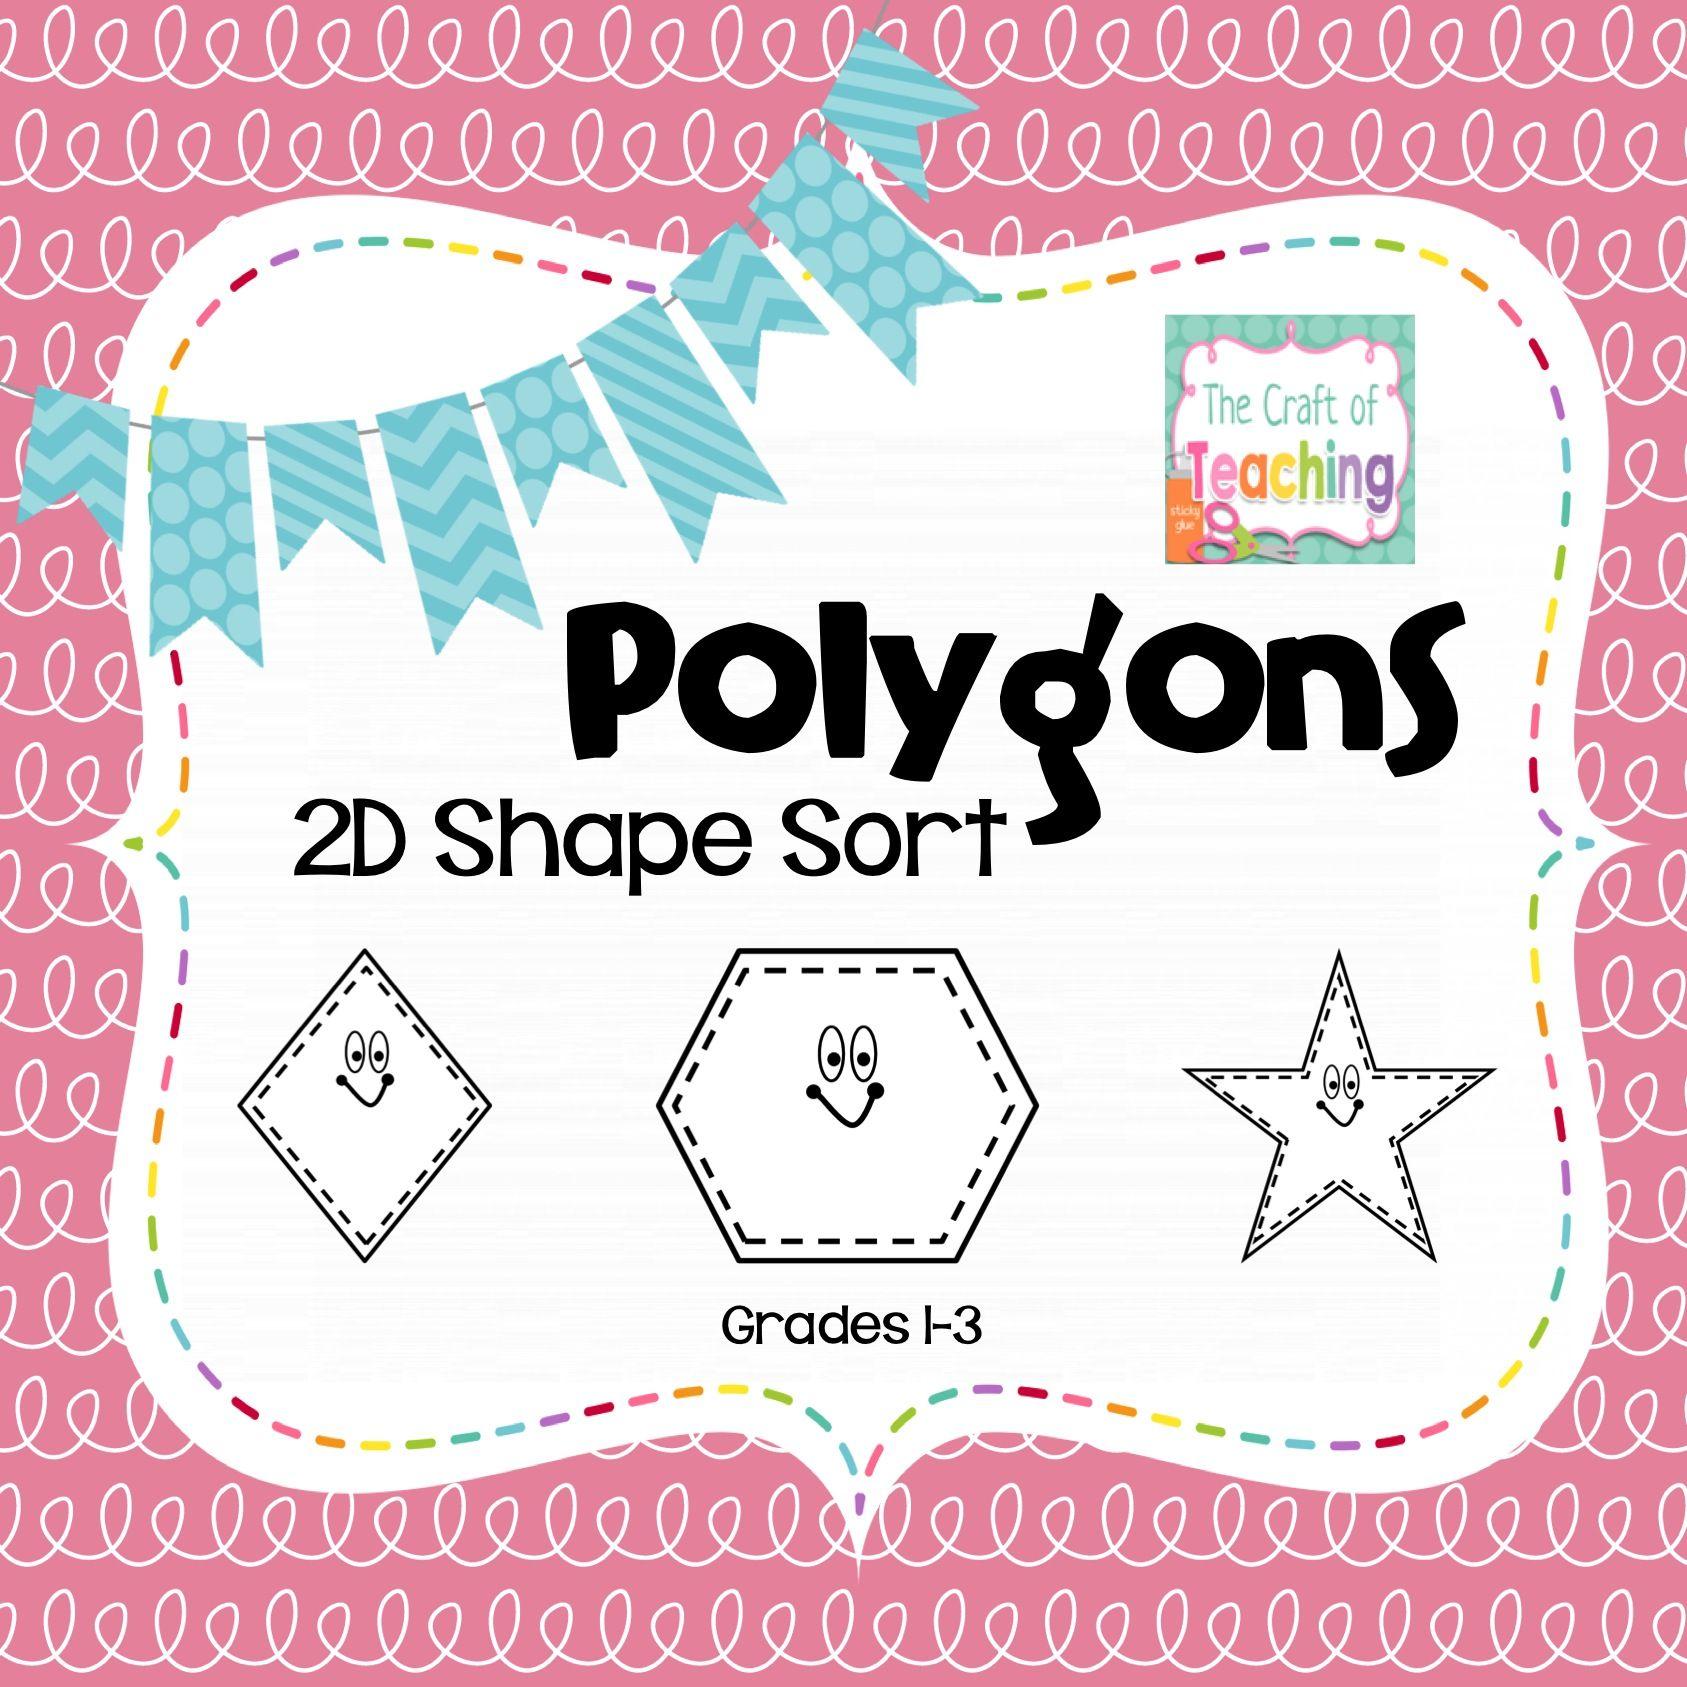 Polygon Shape Sort FREEBIE Shape sort, Polygon shape